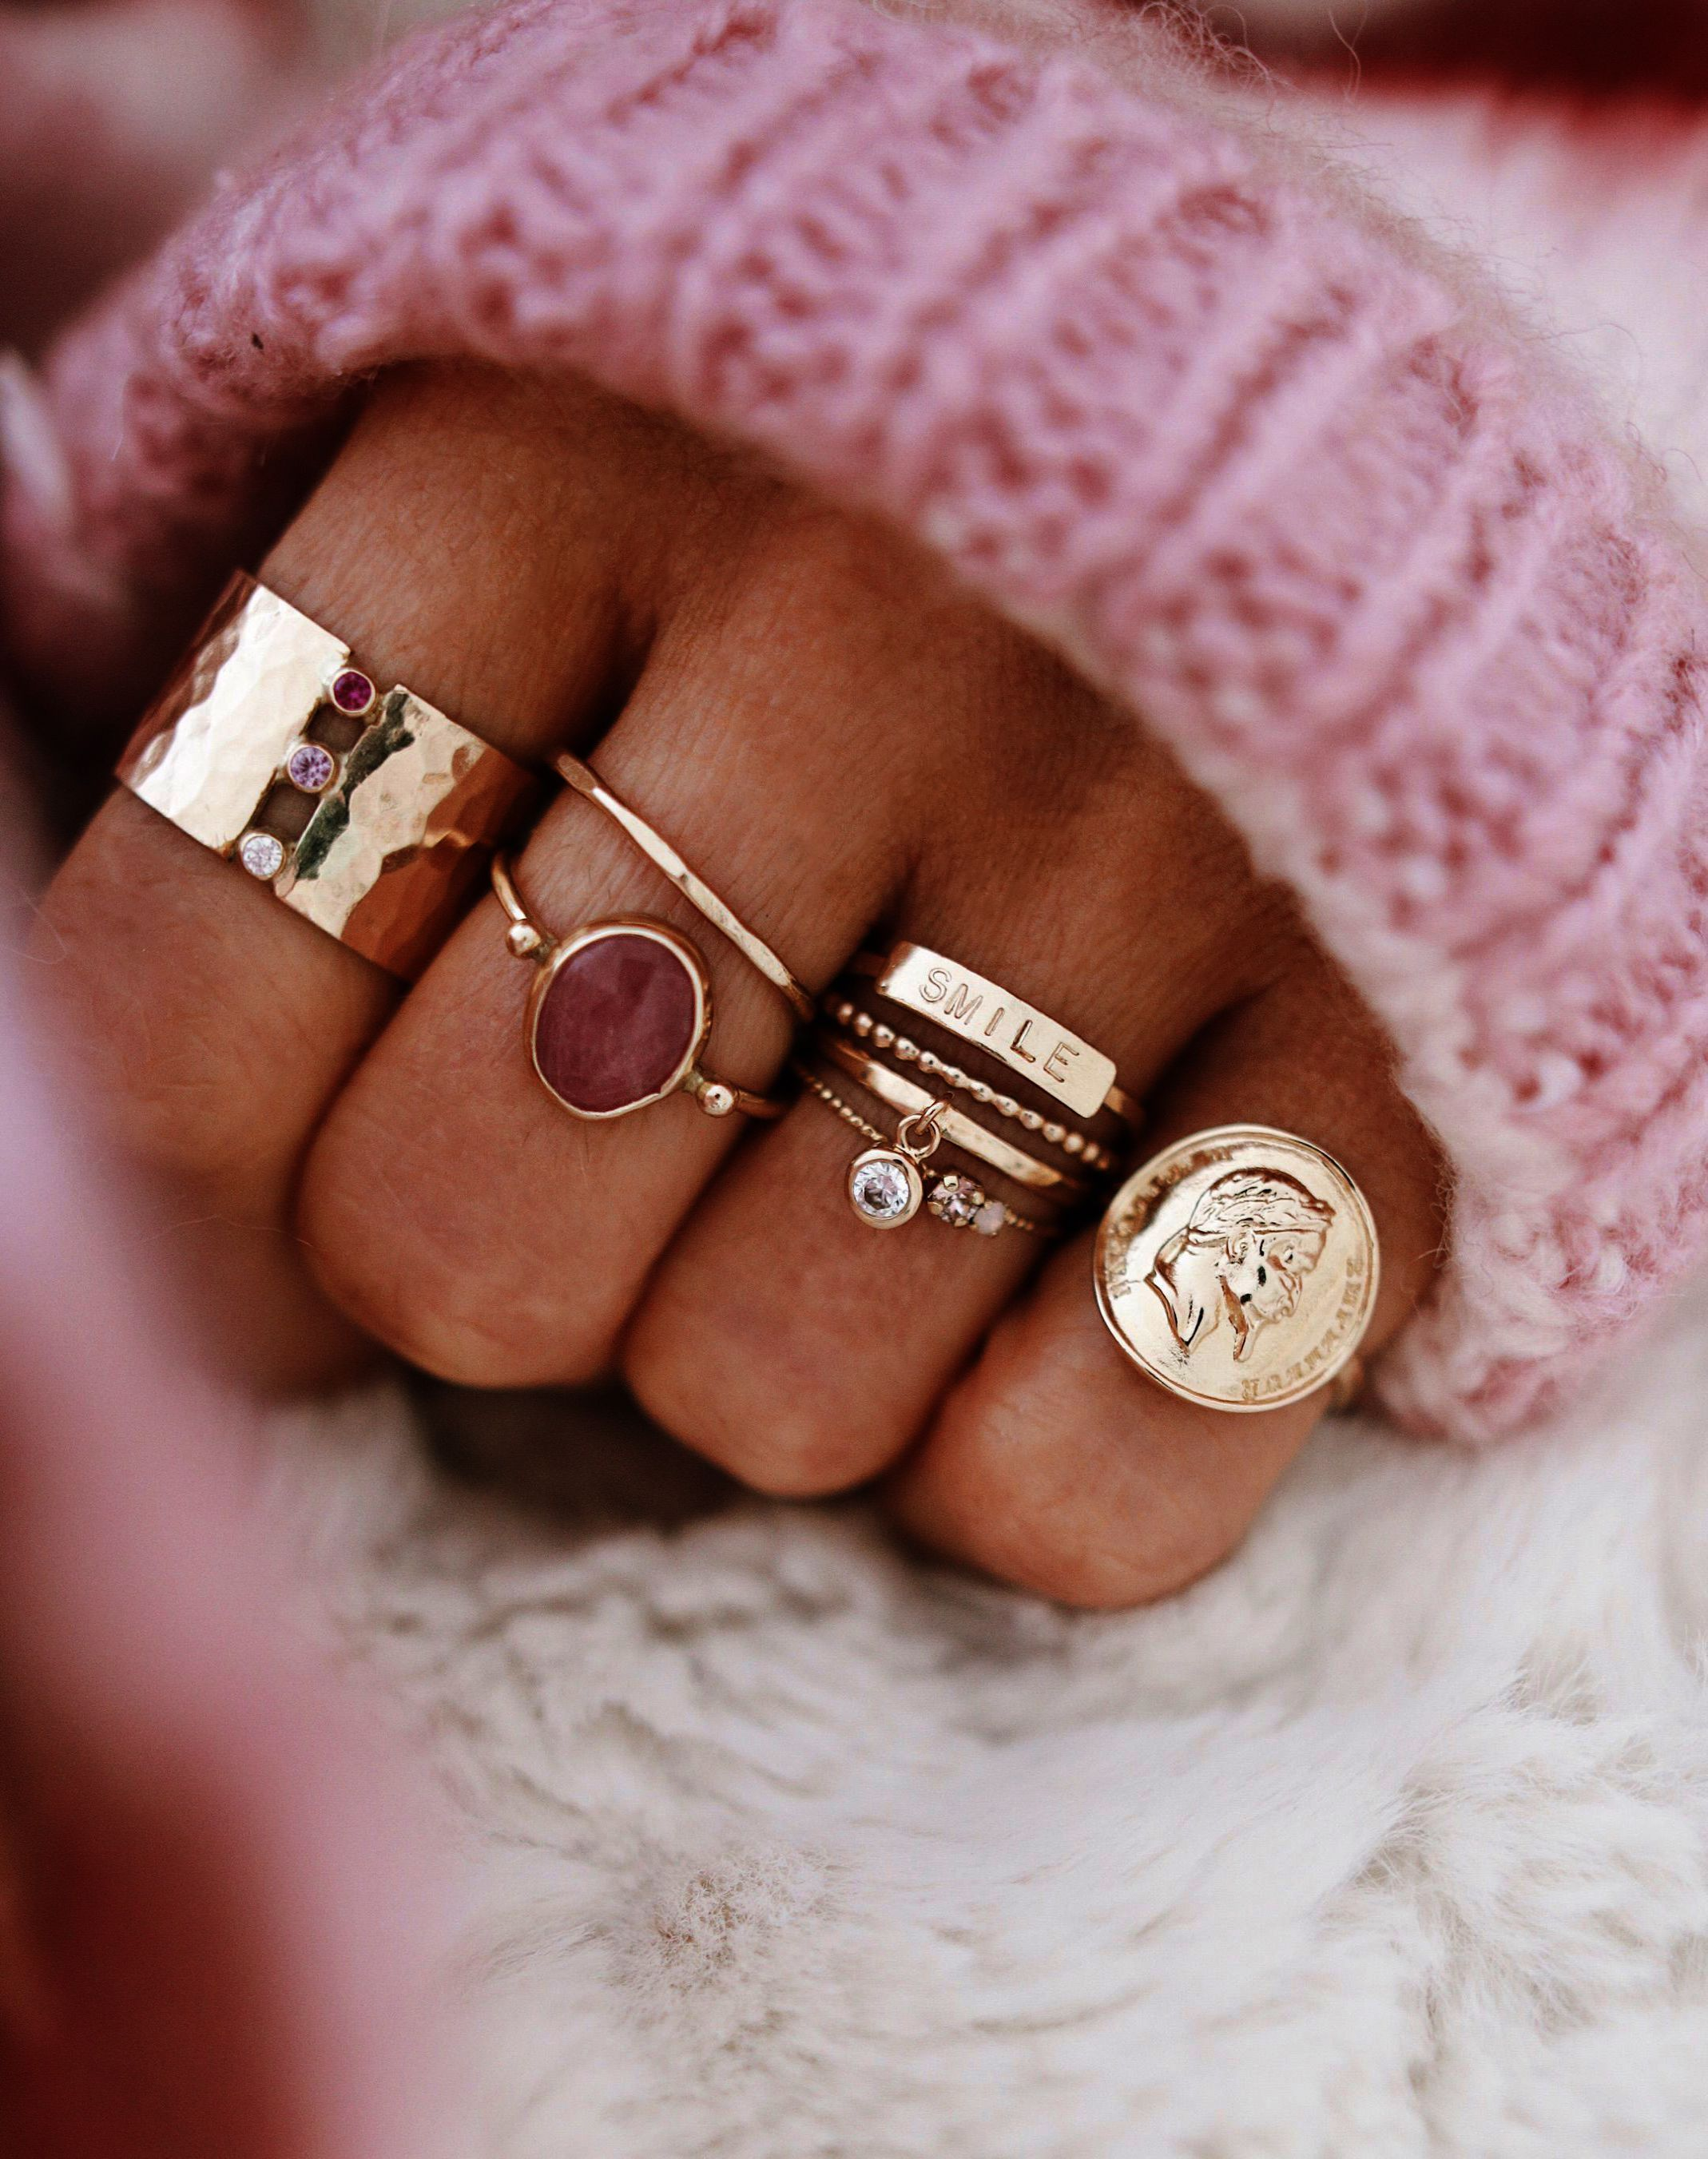 Jewellery Box Diy By Argos Jewellery Exchange It Is Jewellery Shops Johannesburg Jewelry Blogger Jewelry Lover Fine Jewelry